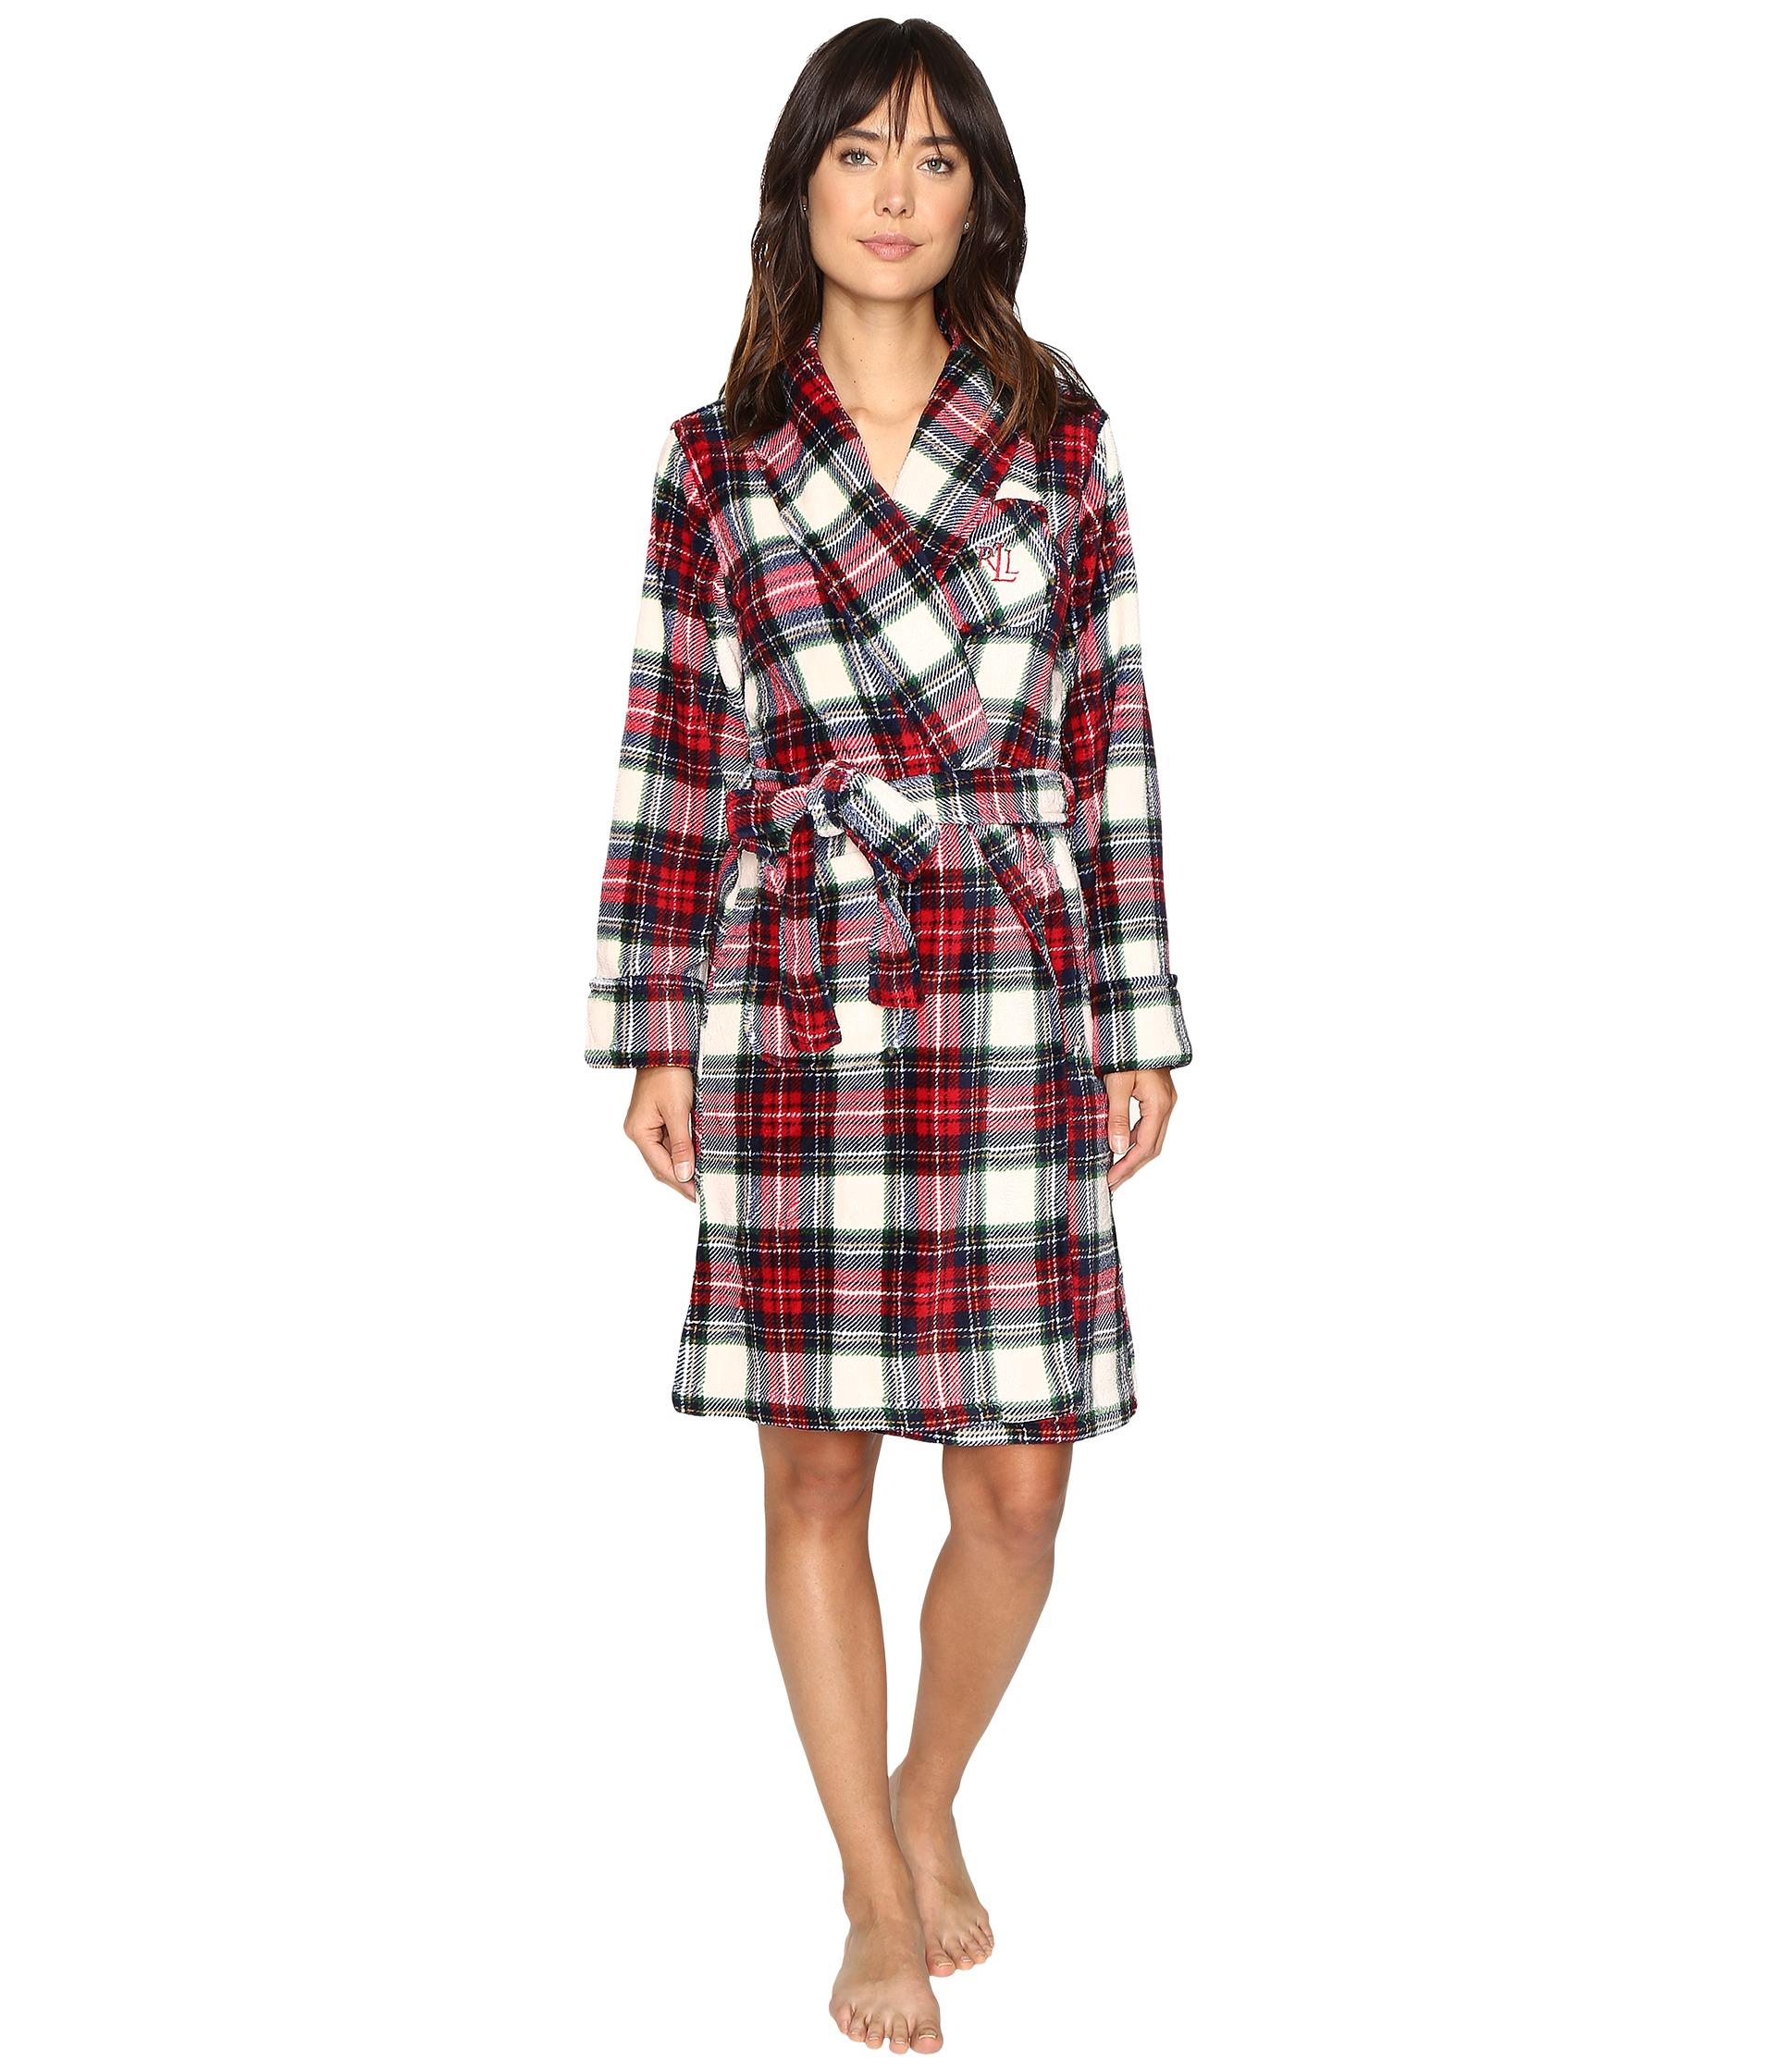 lauren ralph lauren folded so soft terry short robe plaid cream blue red free. Black Bedroom Furniture Sets. Home Design Ideas